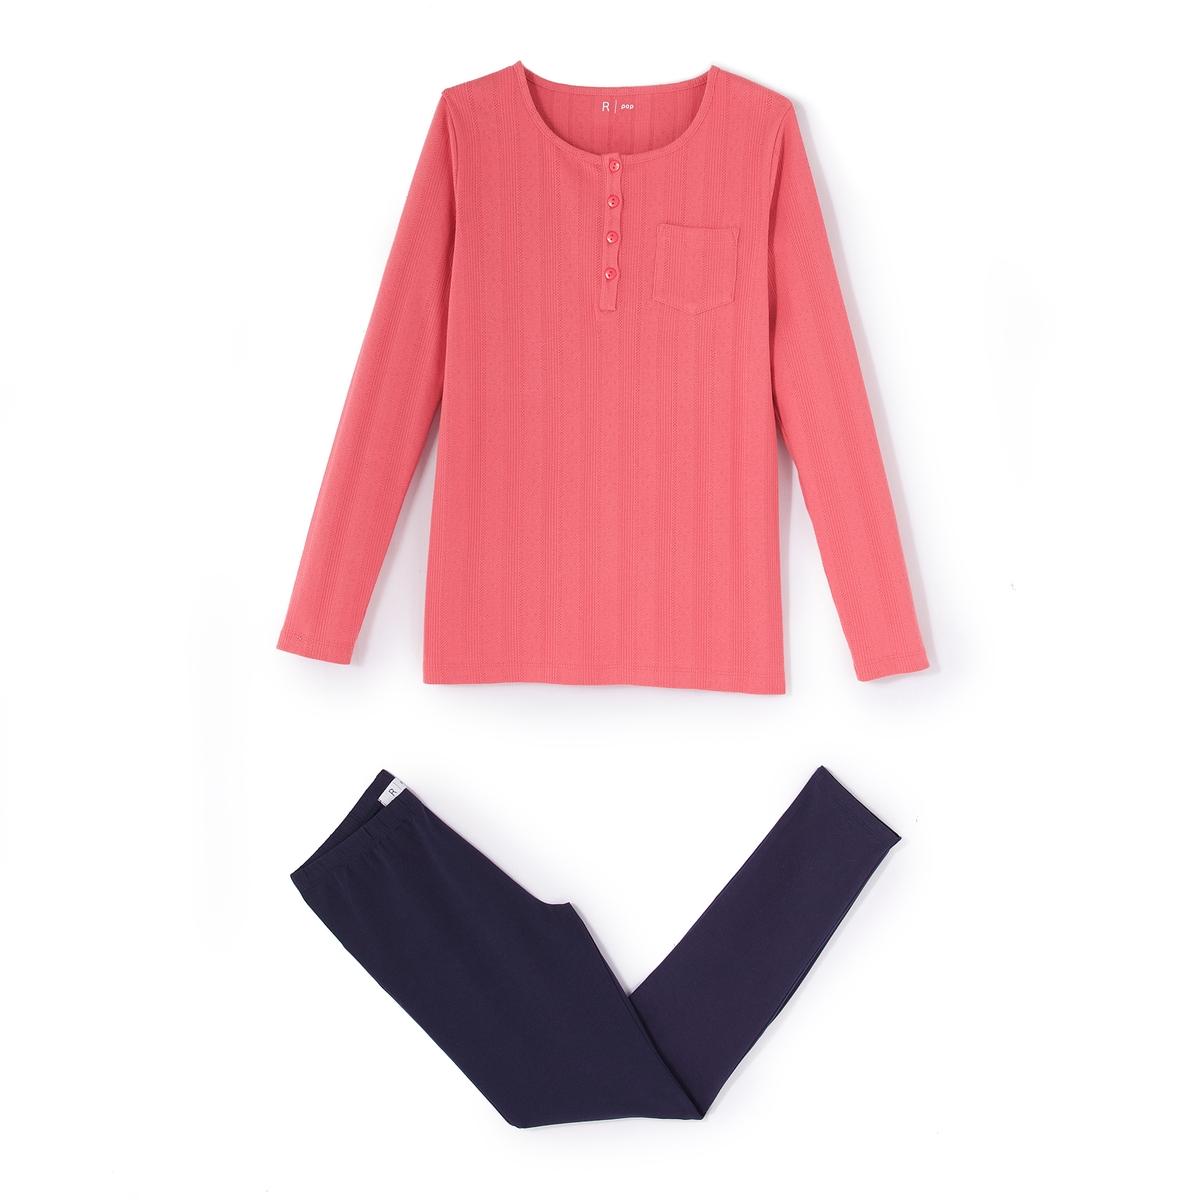 Пижама из джерси, преобладание хлопка пижама из атласа и джерси